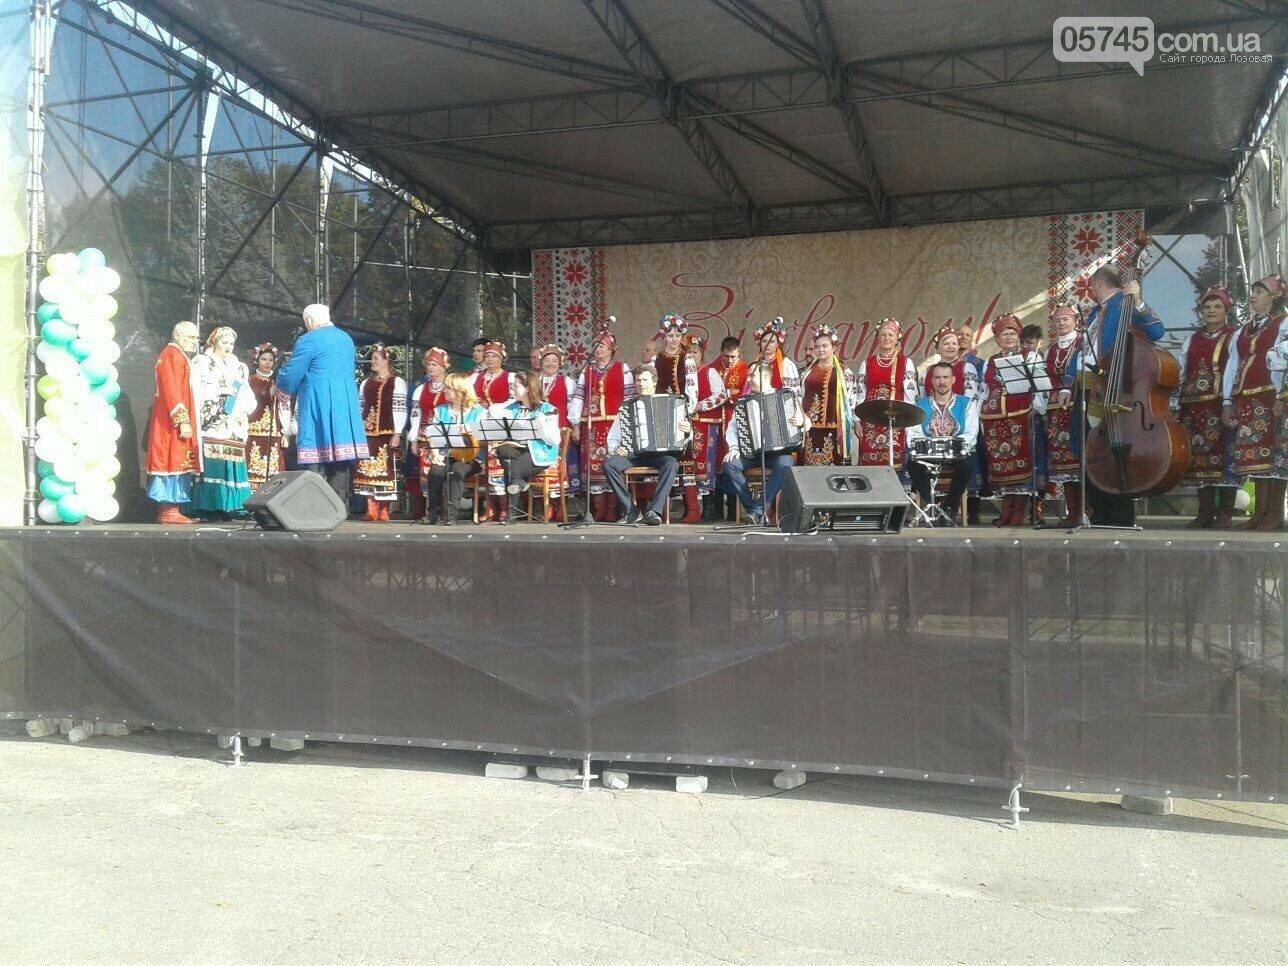 Без масок и карантина: как Лозовщина праздновала День защитника Украины год назад (ФОТО), фото-12